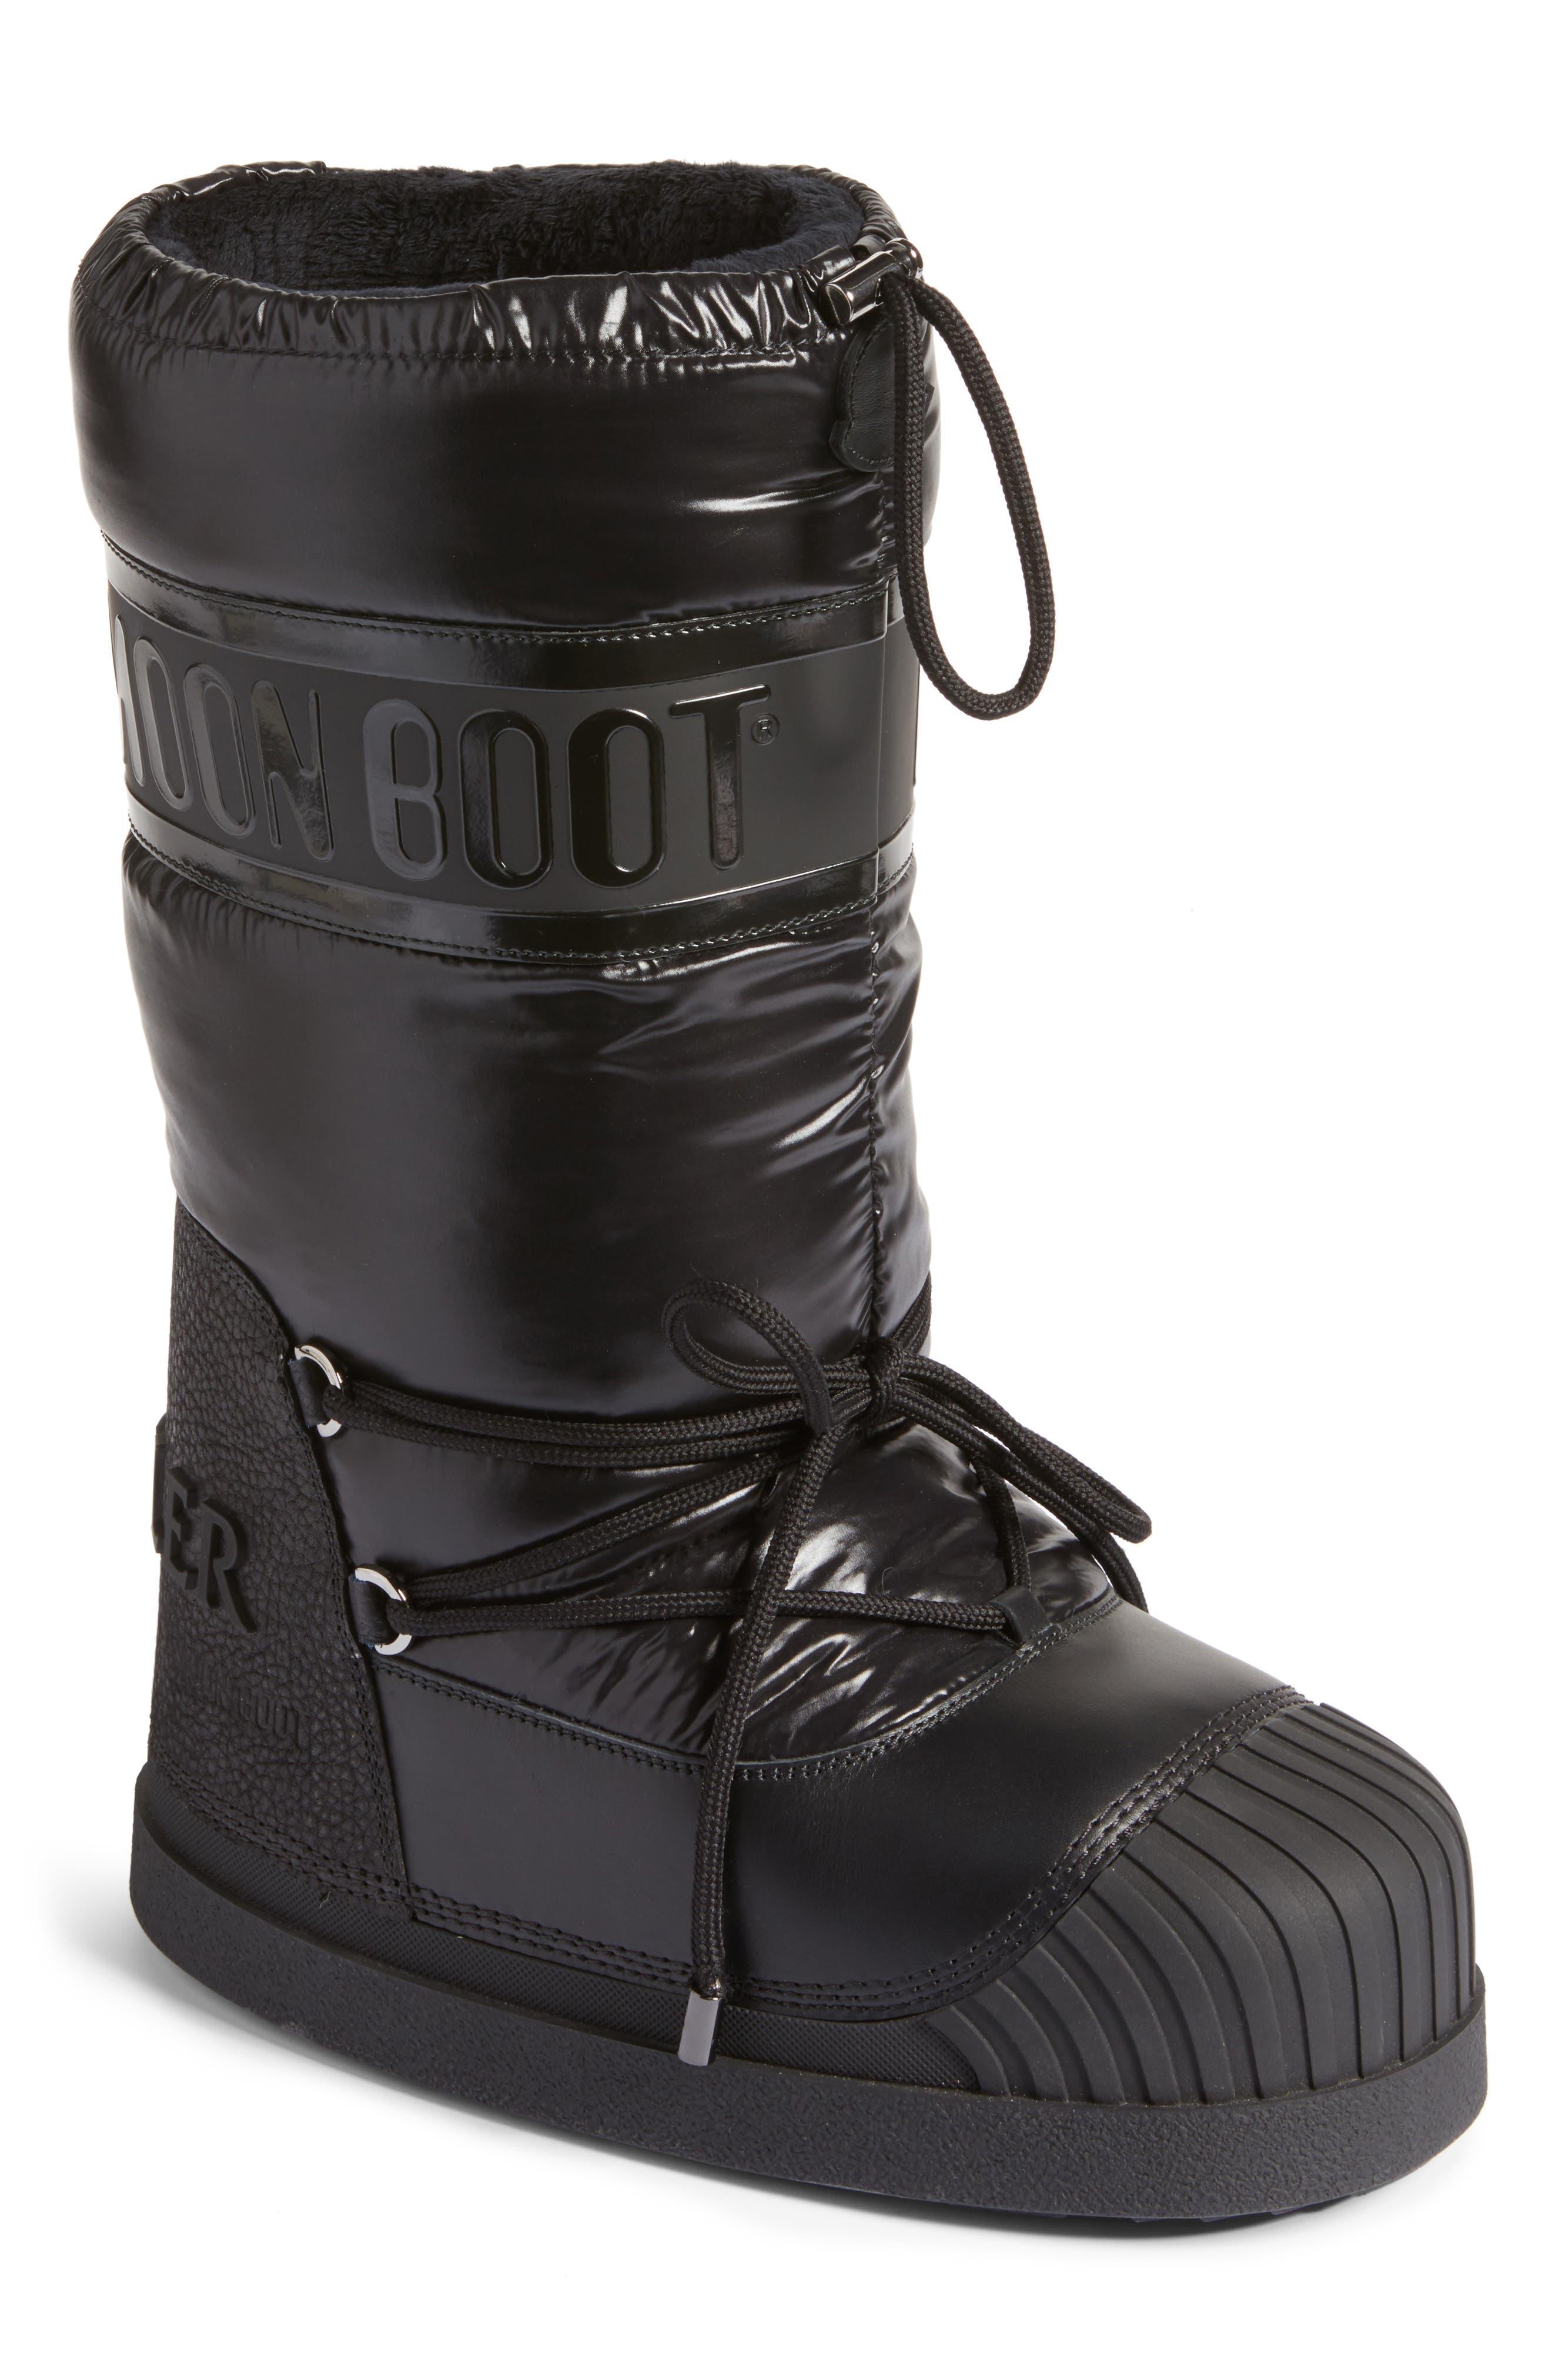 Calvin Klein 205W39NYC Black Venus Moon Boots qIUUvD